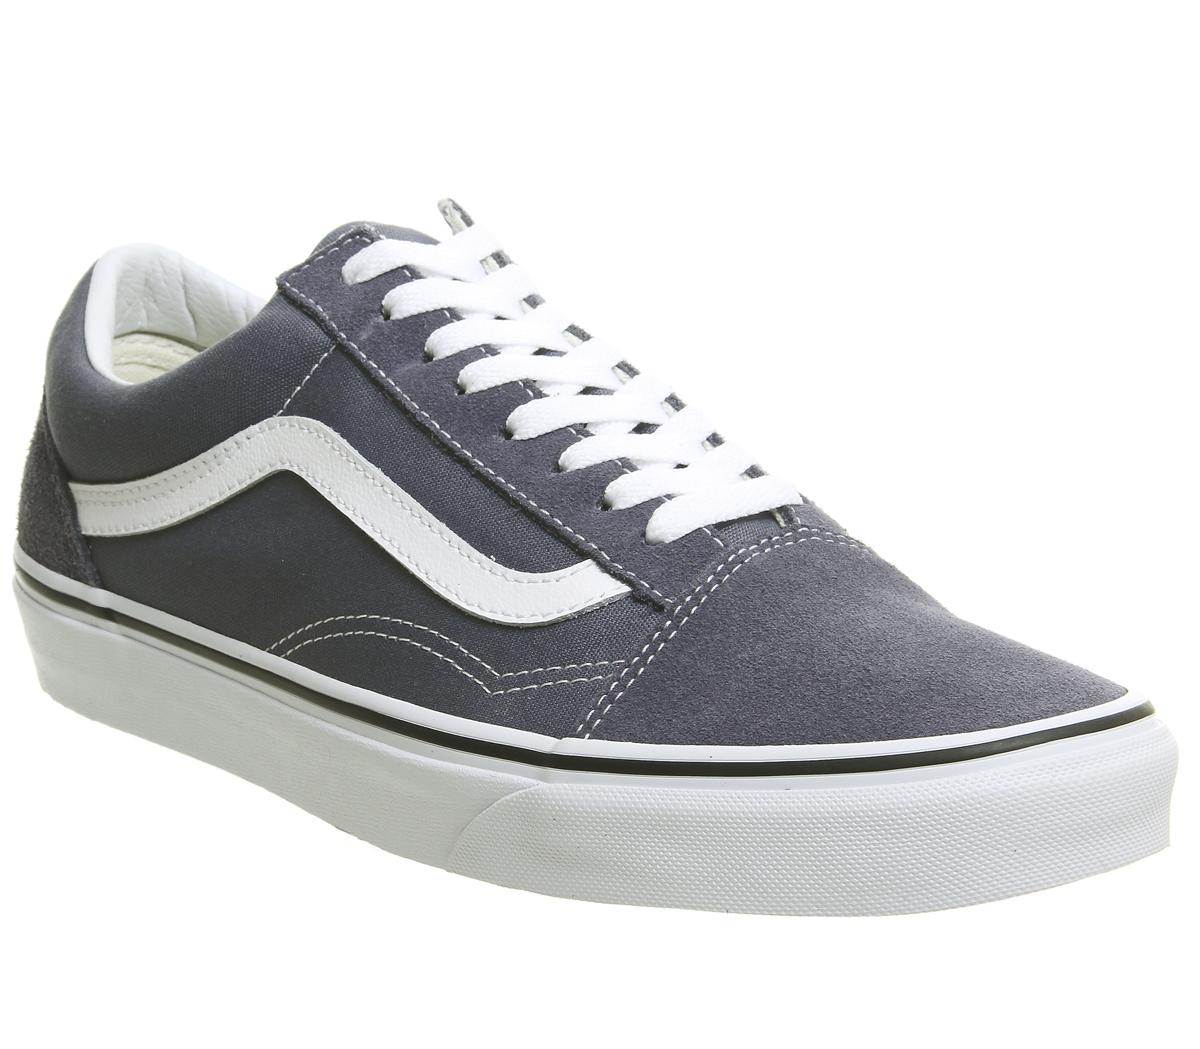 SENTINEL Mens Vans Old Skool formatori GRISAILLE formatori scarpe bianco d133eb4f024